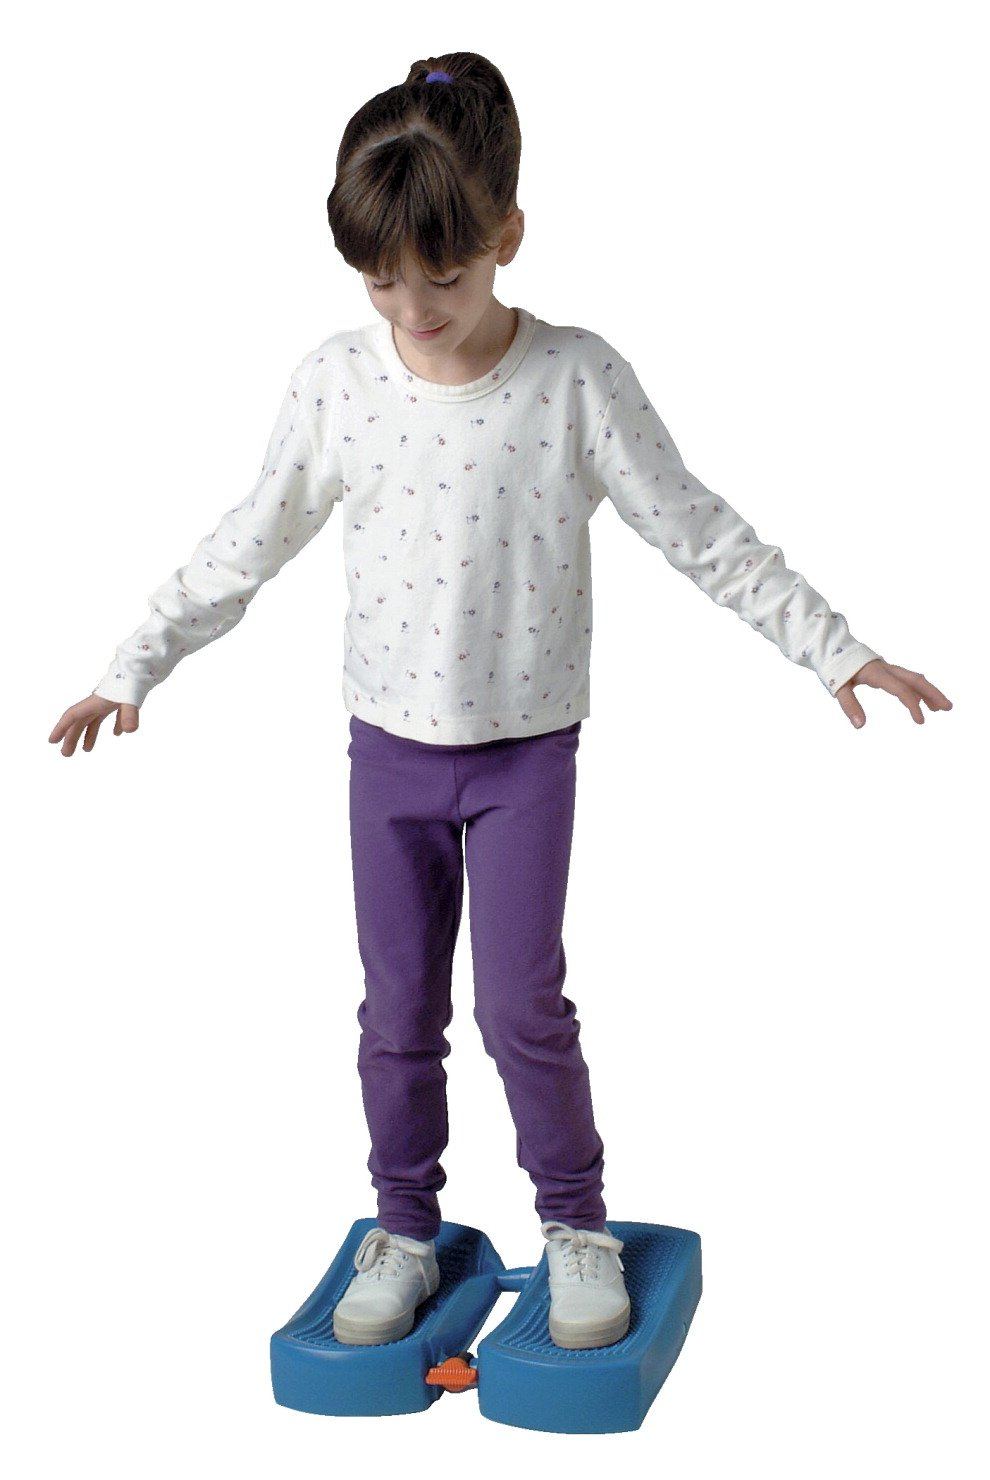 Gymnic Movin' Step Inflatable Balance Base, Purple